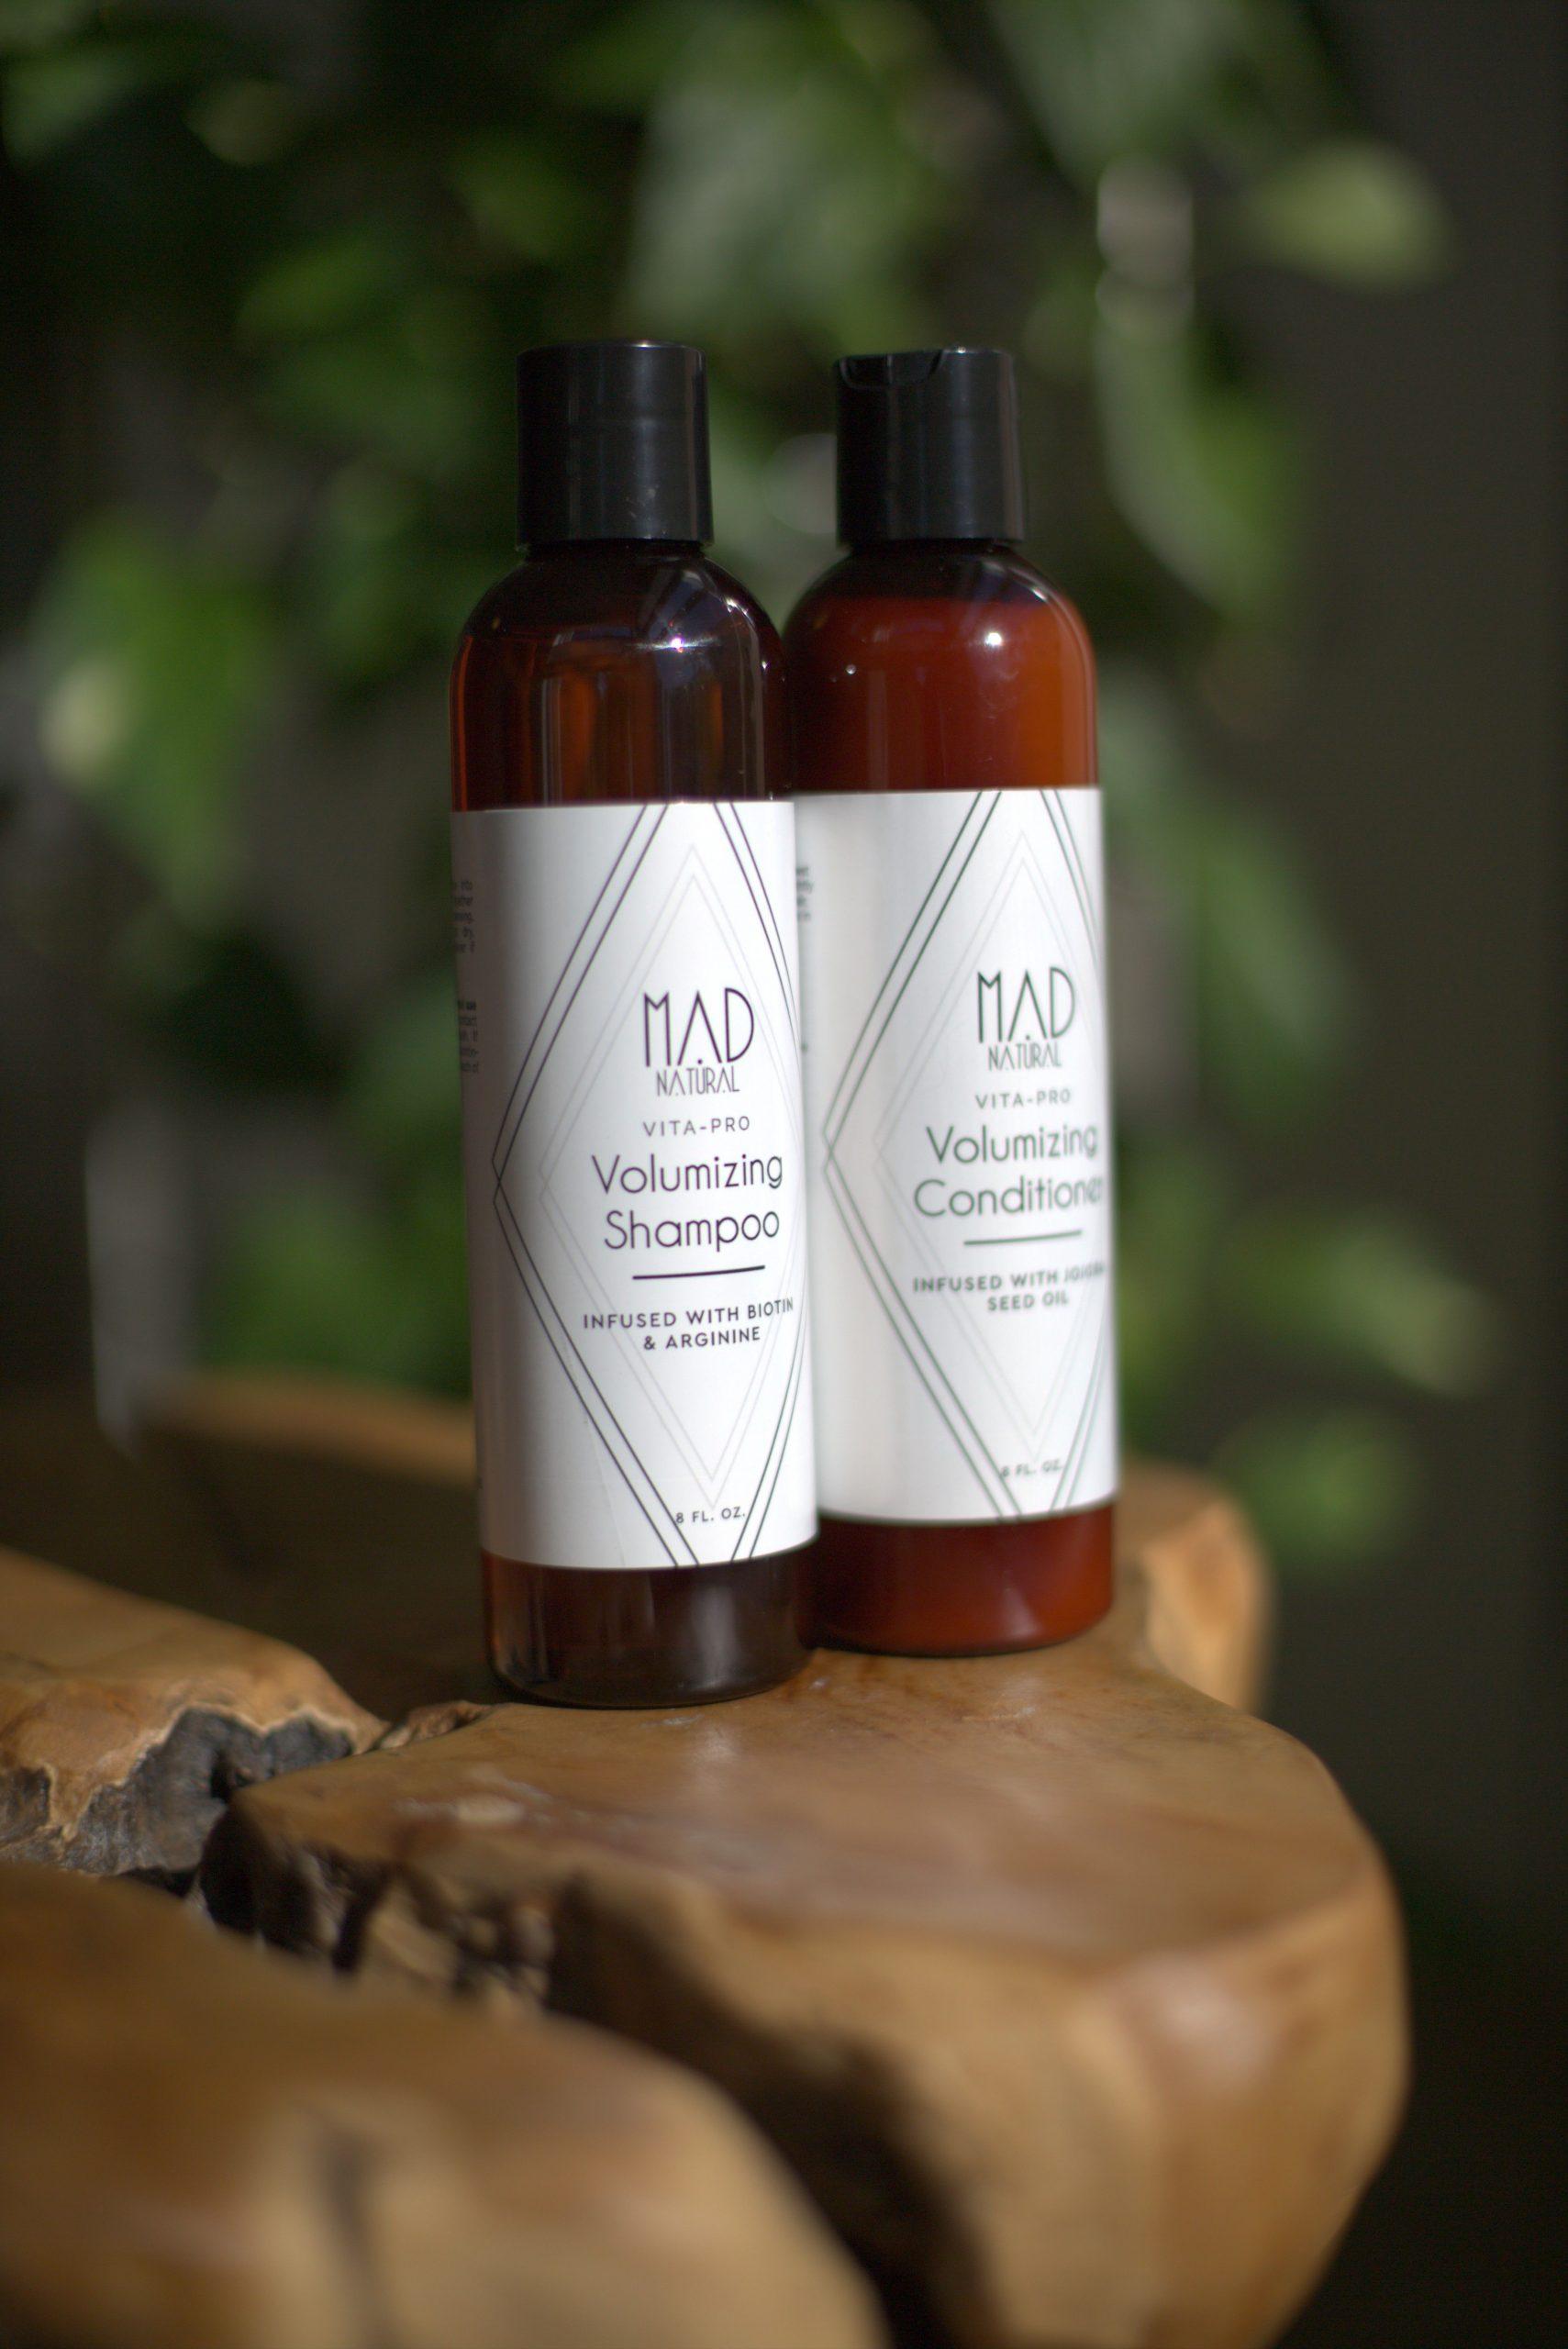 Vita Pro Shampoo